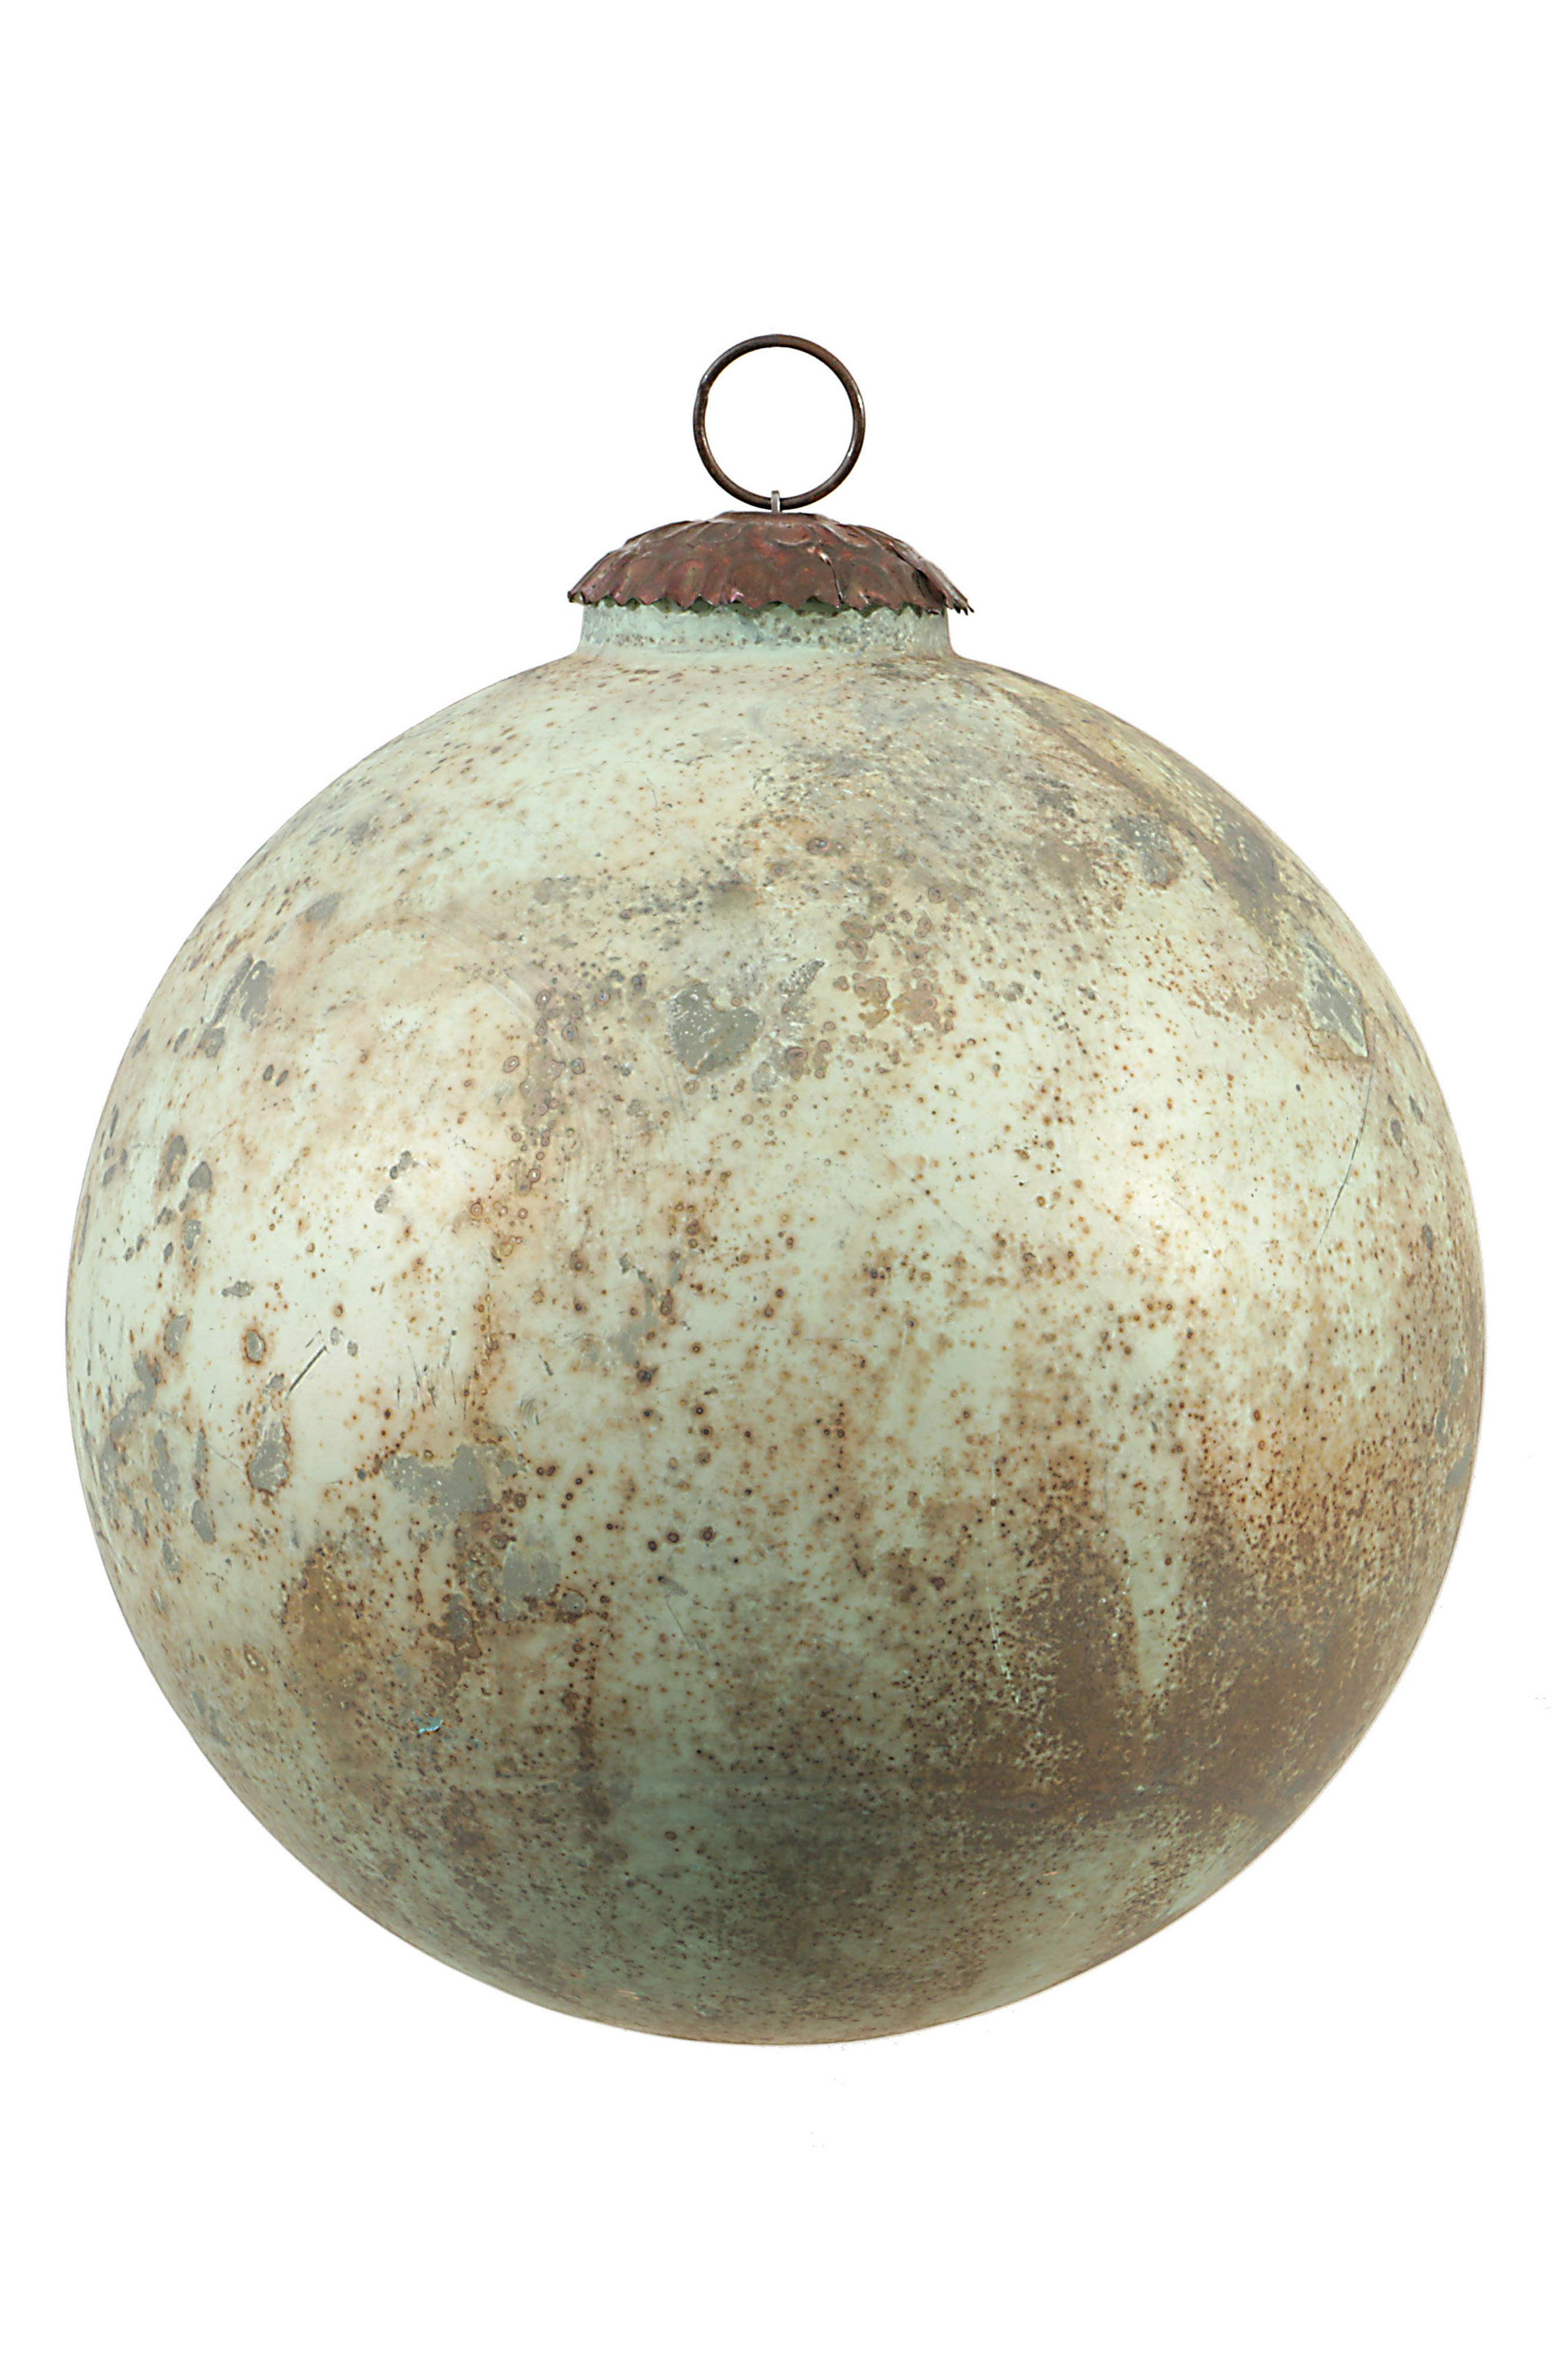 Marbled Mercury Glass Ball Ornament,                             Main thumbnail 1, color,                             400